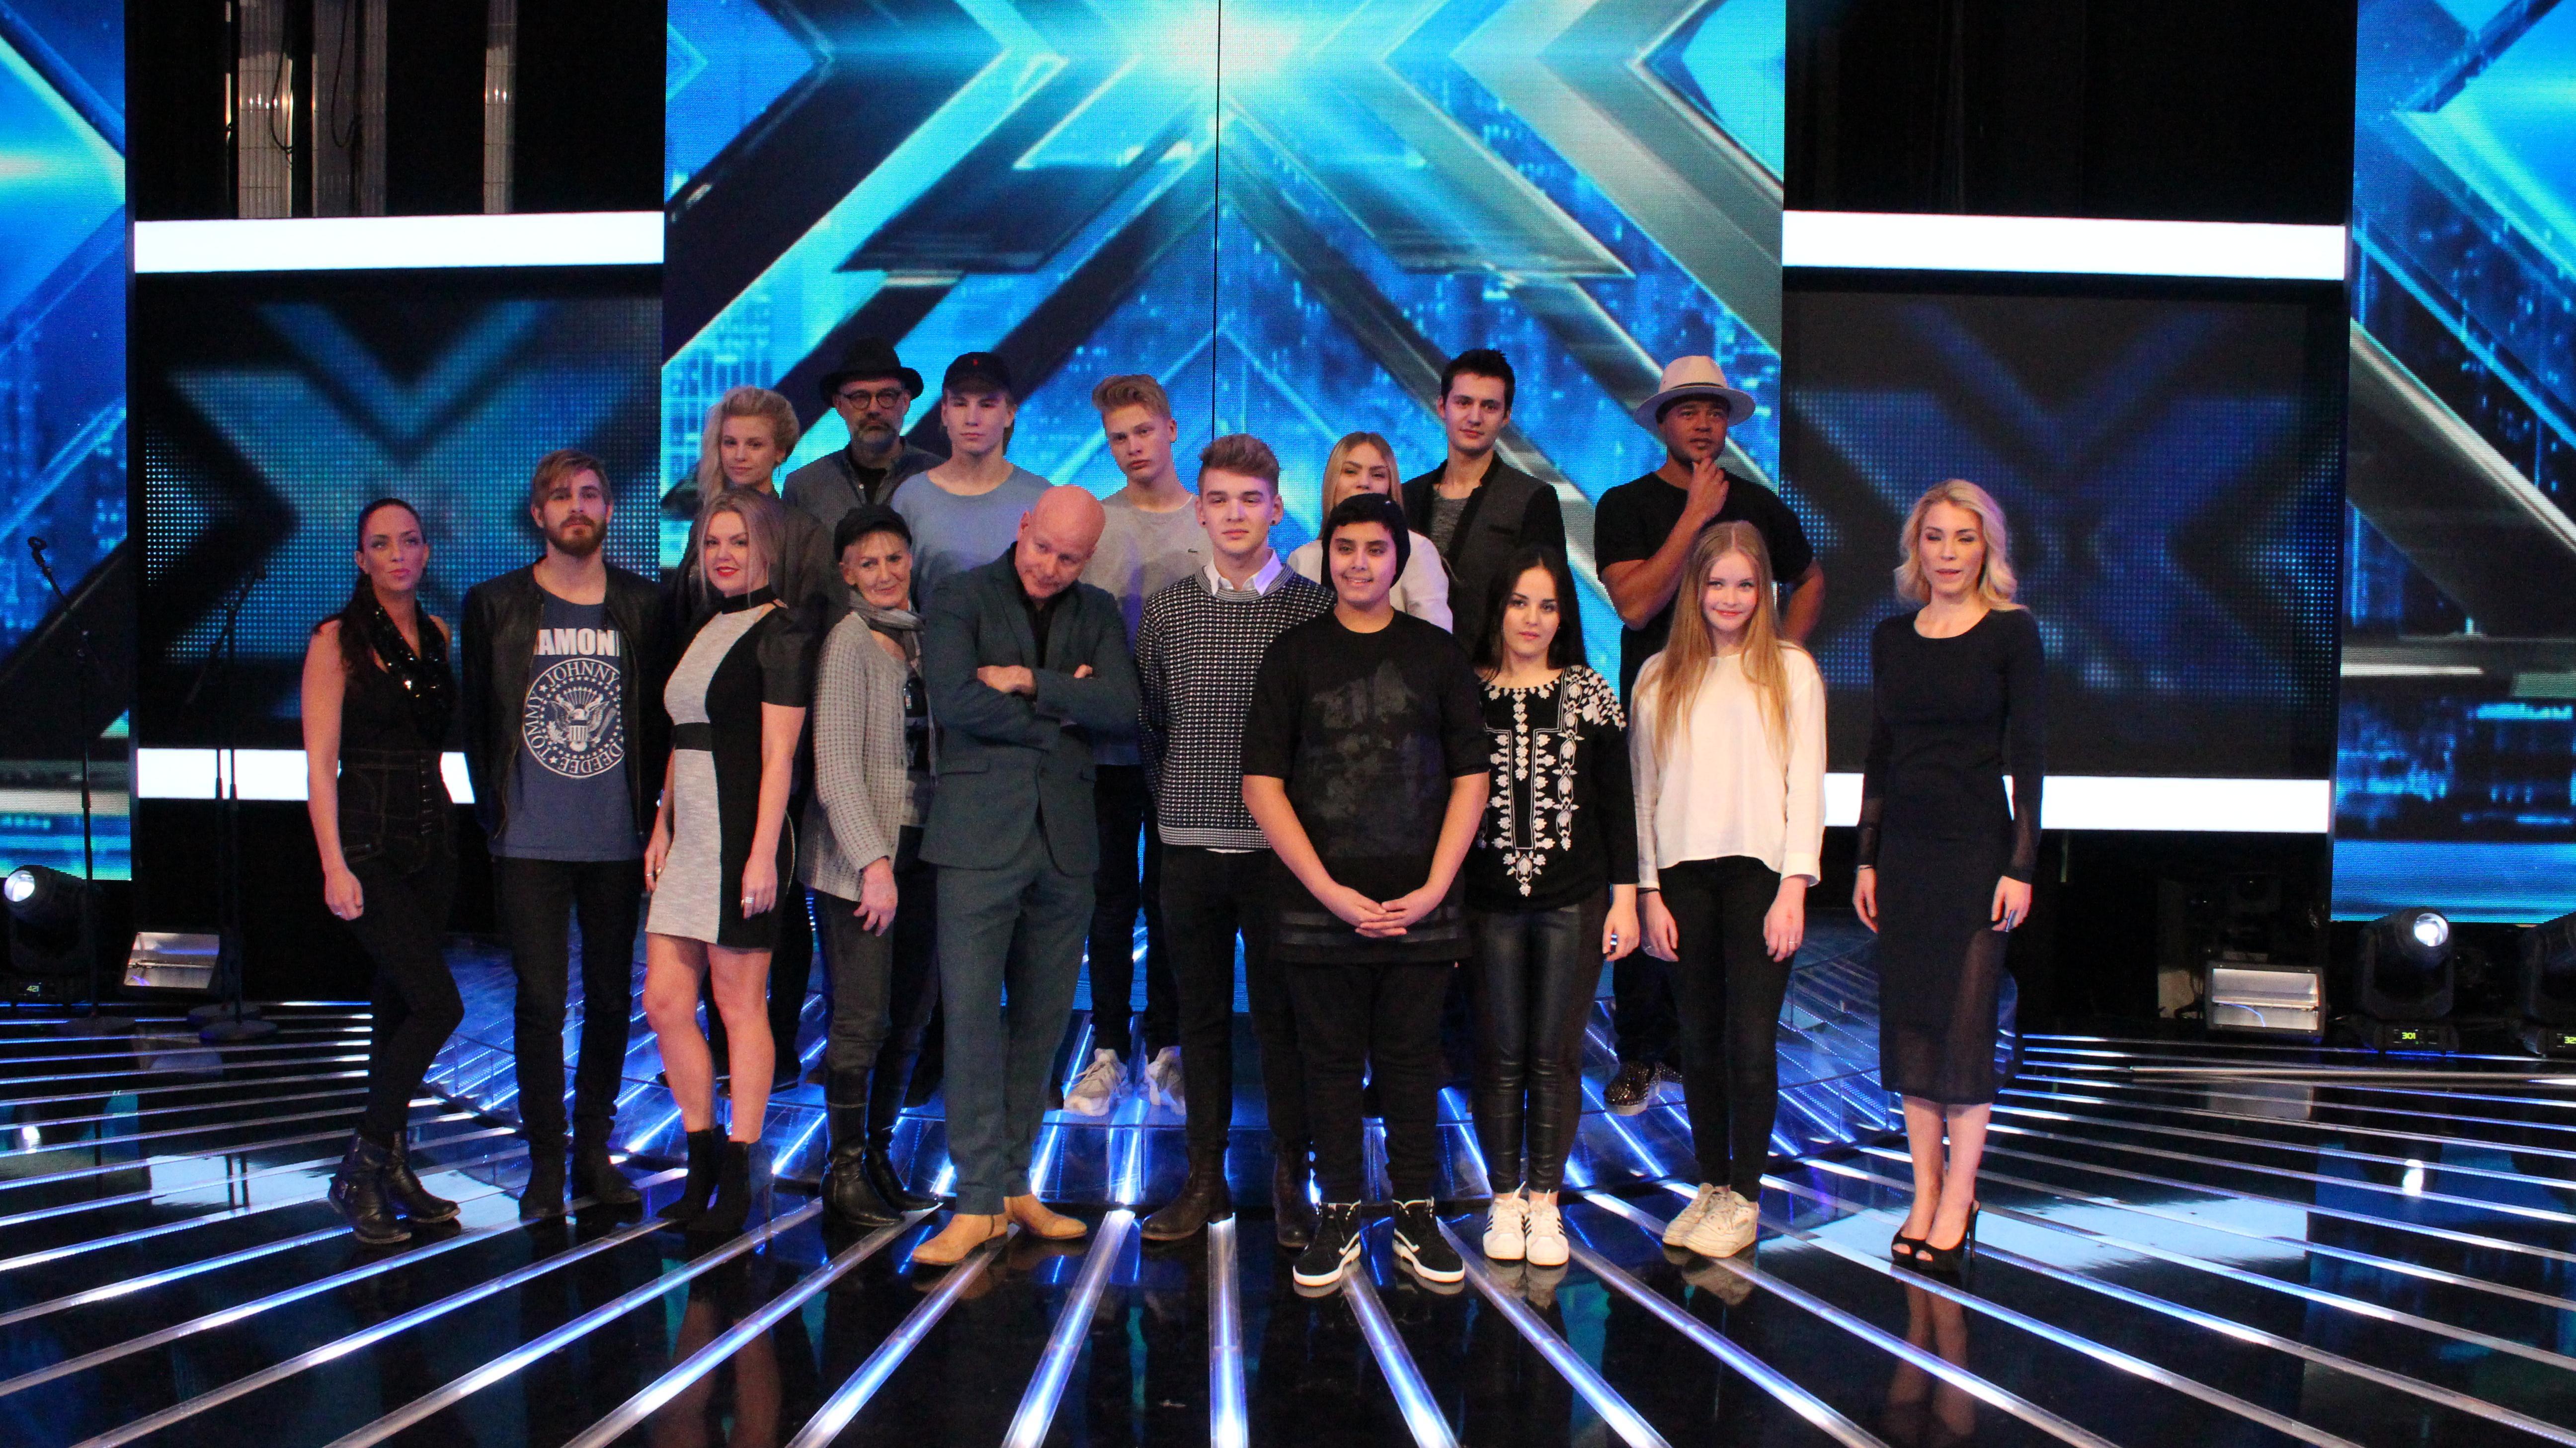 X Factor 2015 pressemøde